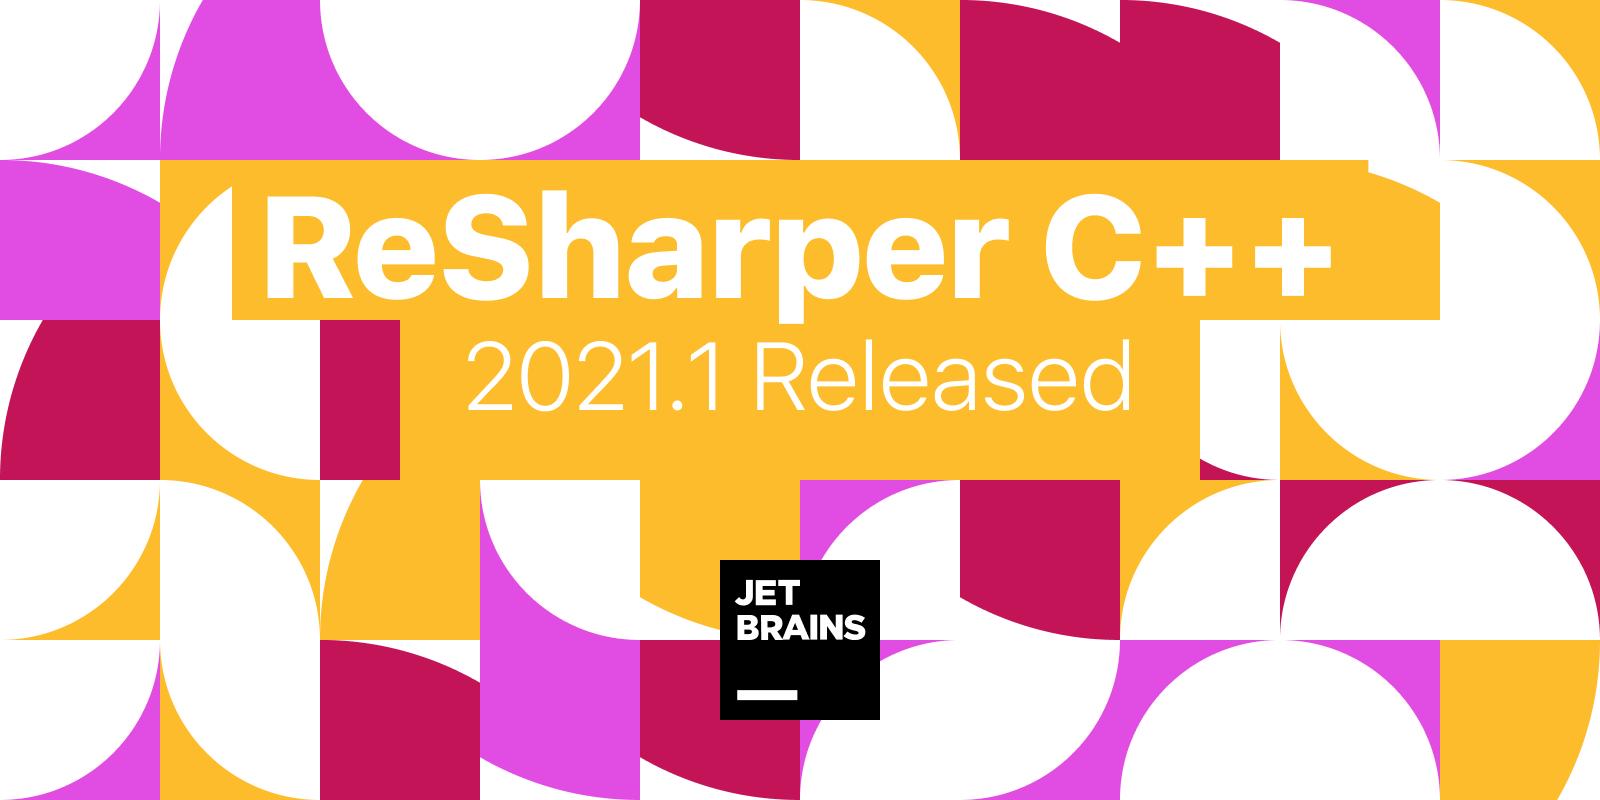 ReSharper C++ 2021.1